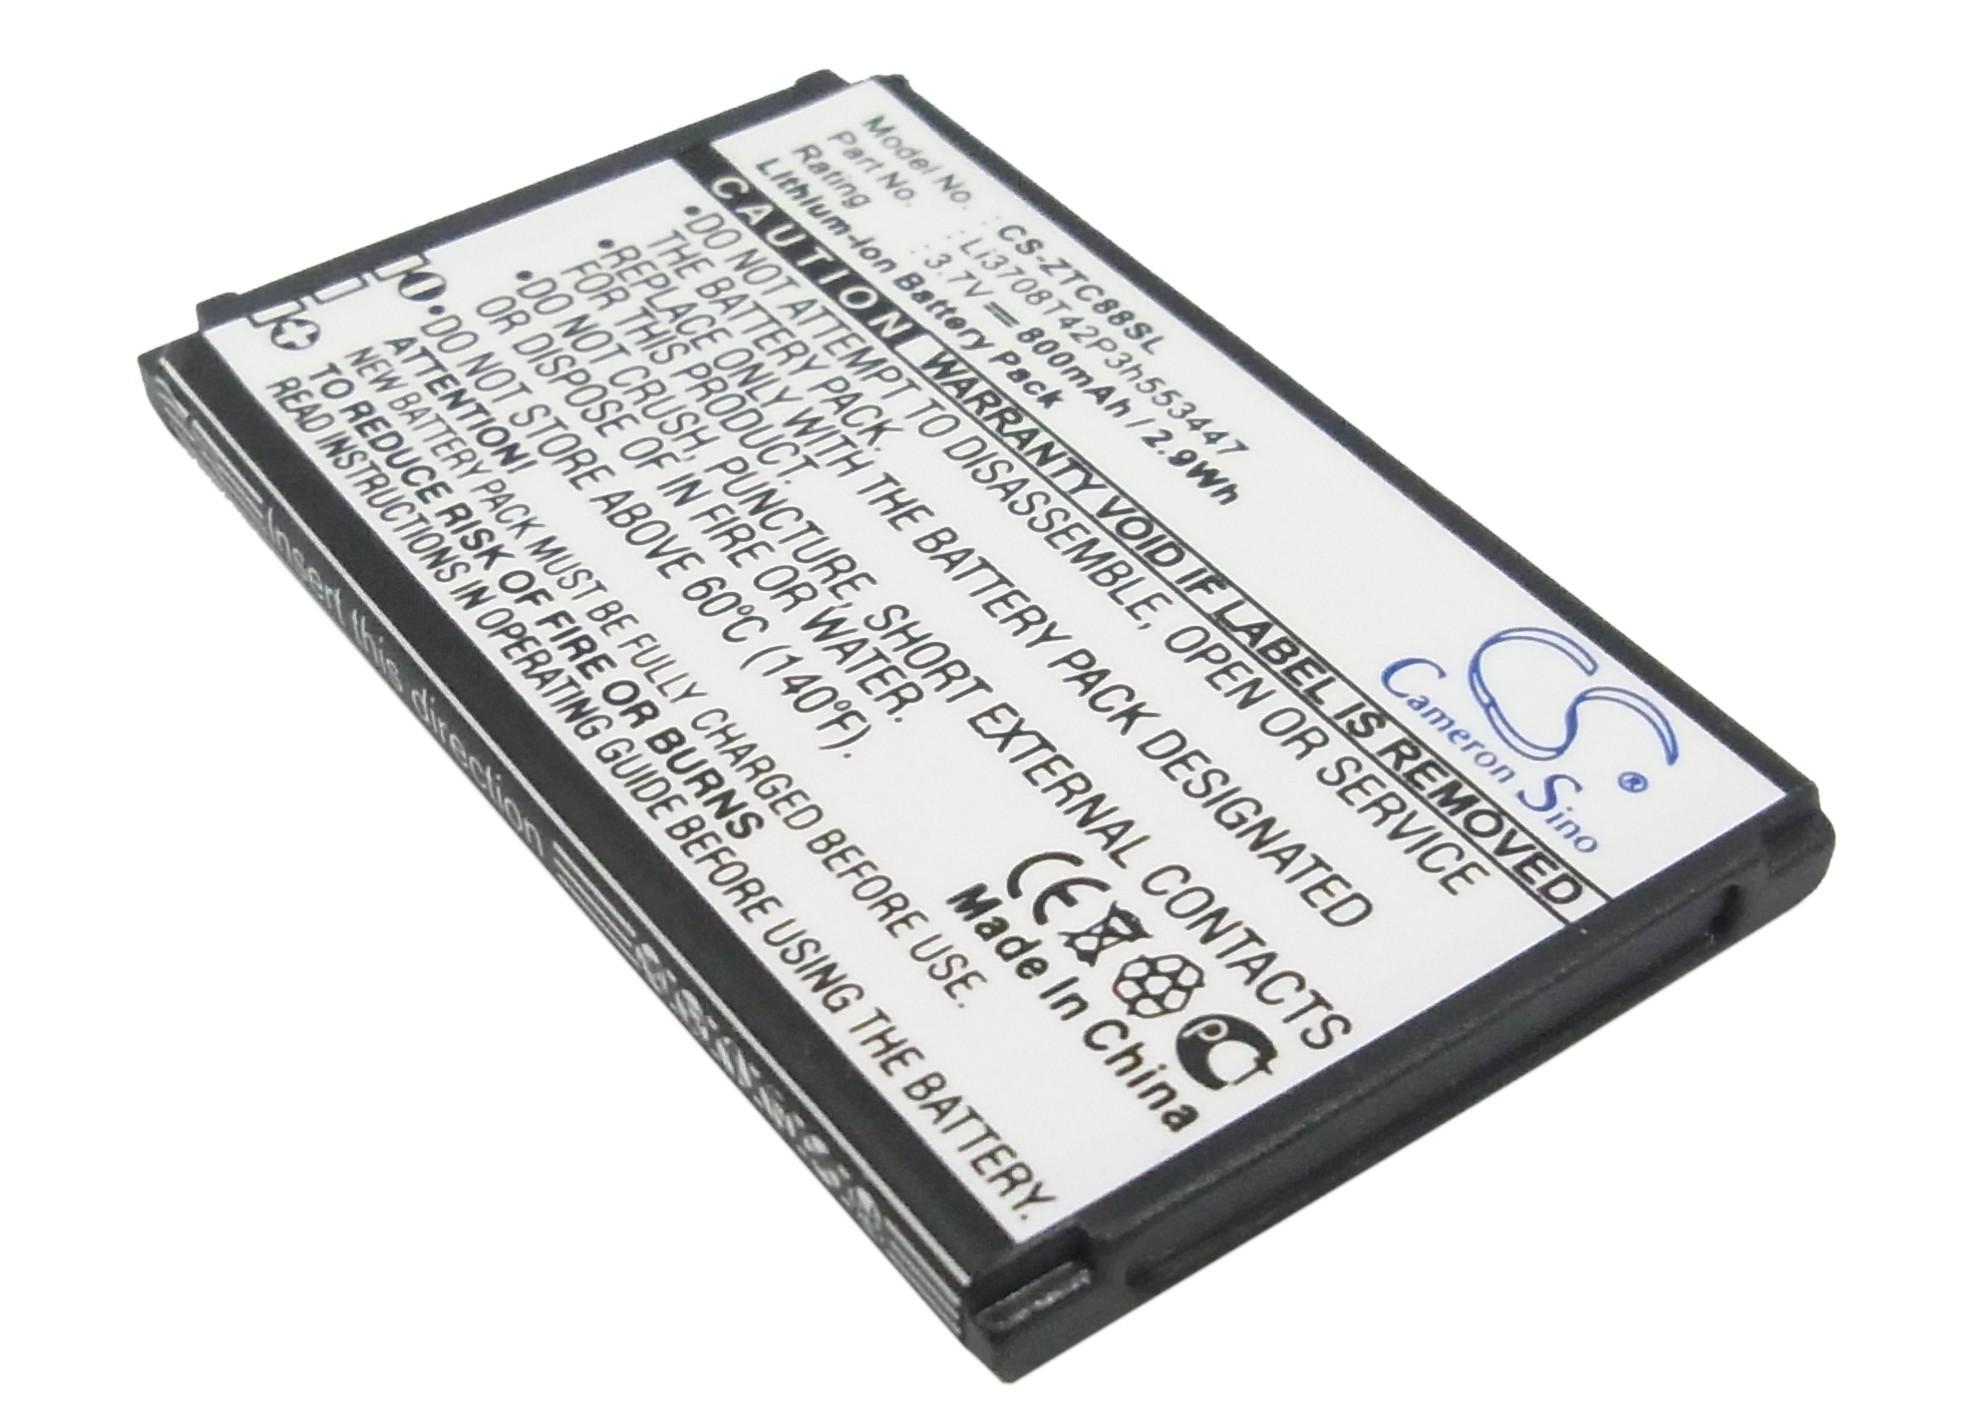 Аккумулятор для МТС 840, Билайн С200 800mah CS CameronSino